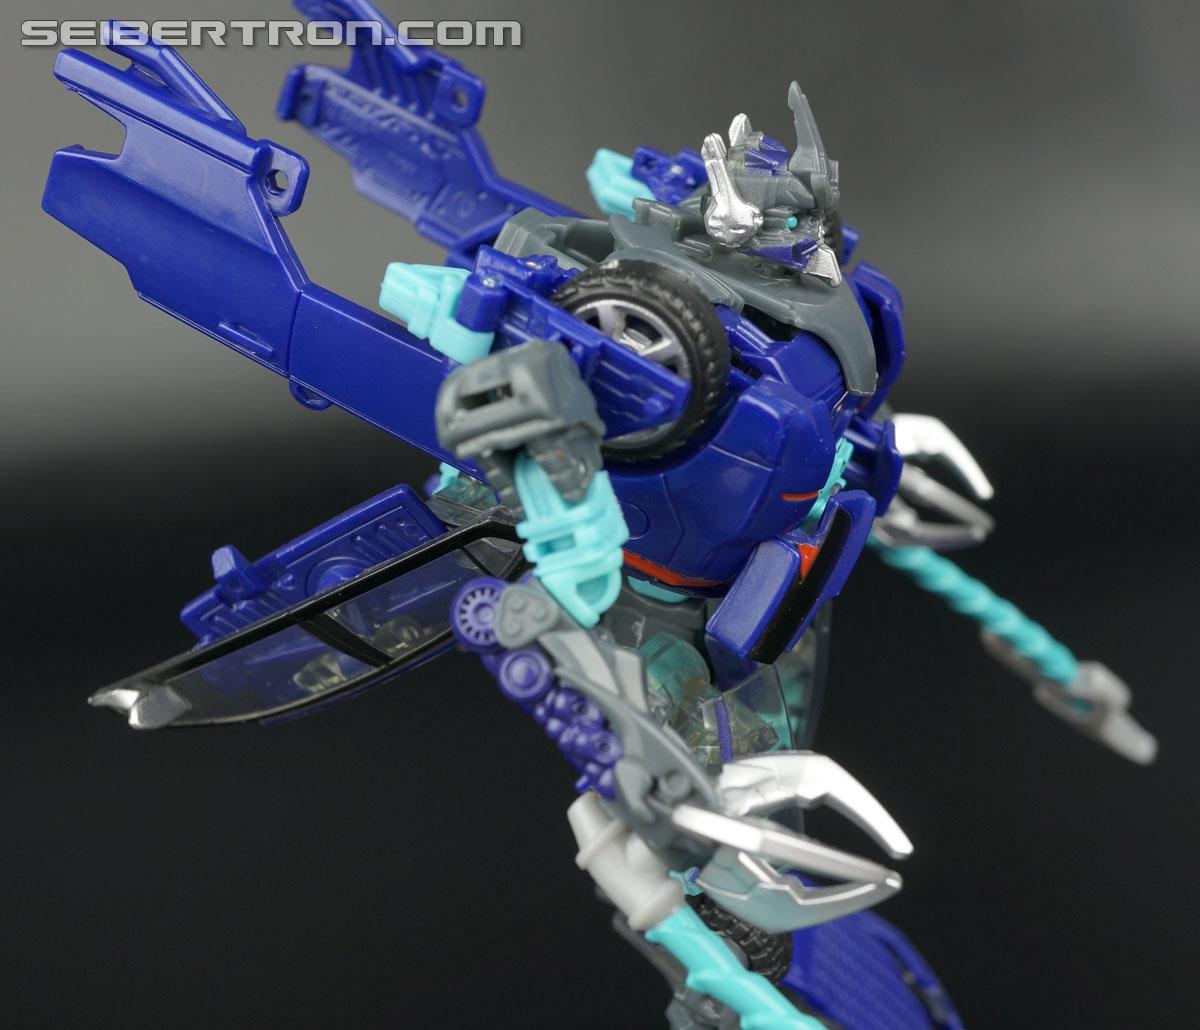 Transformers Takara Tomy: Movie Advanced Jolt (Image #66 of 118)